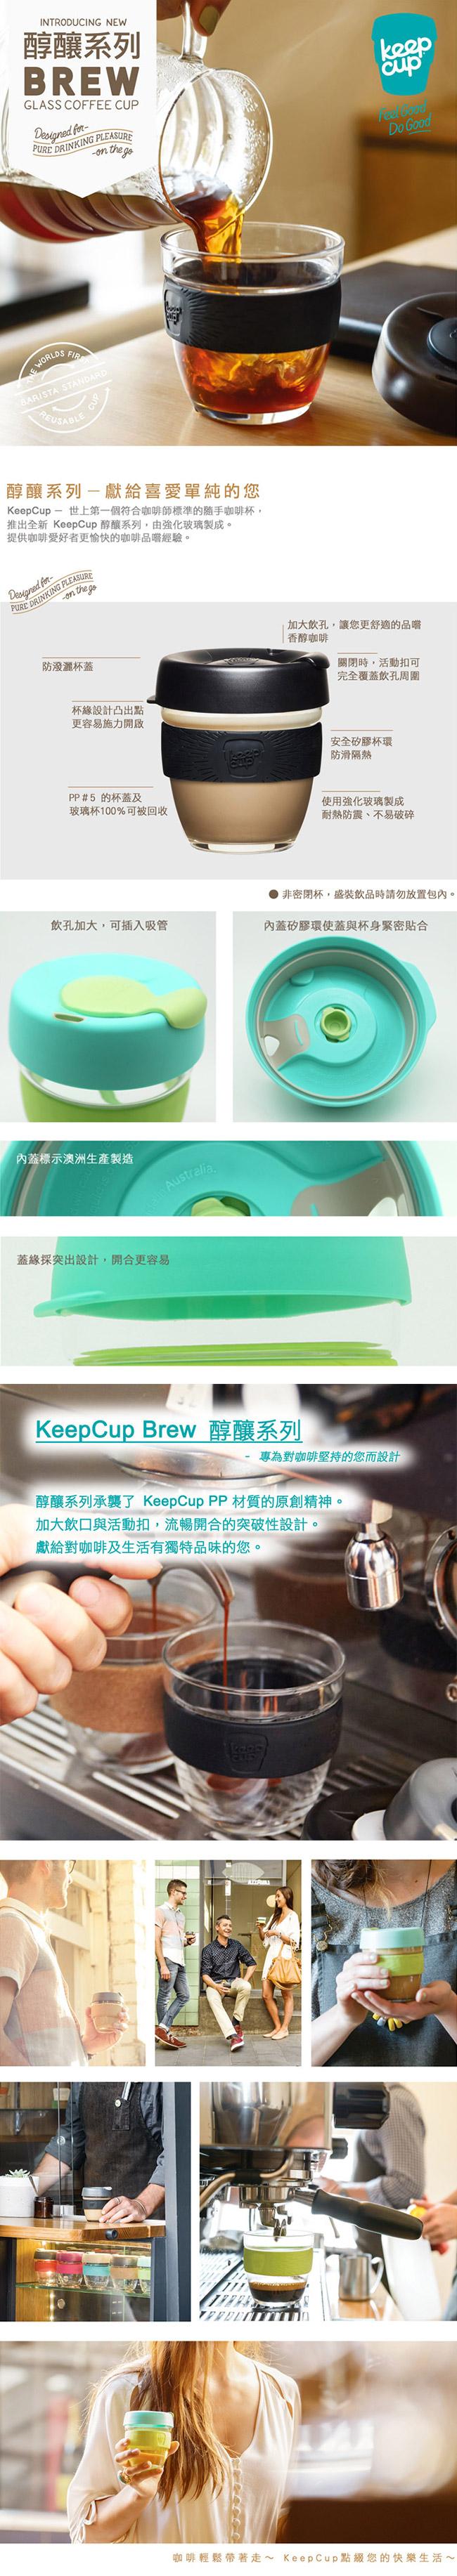 [FINAL CALL] KeepCup 隨手咖啡杯 醇釀系列 M 摩卡